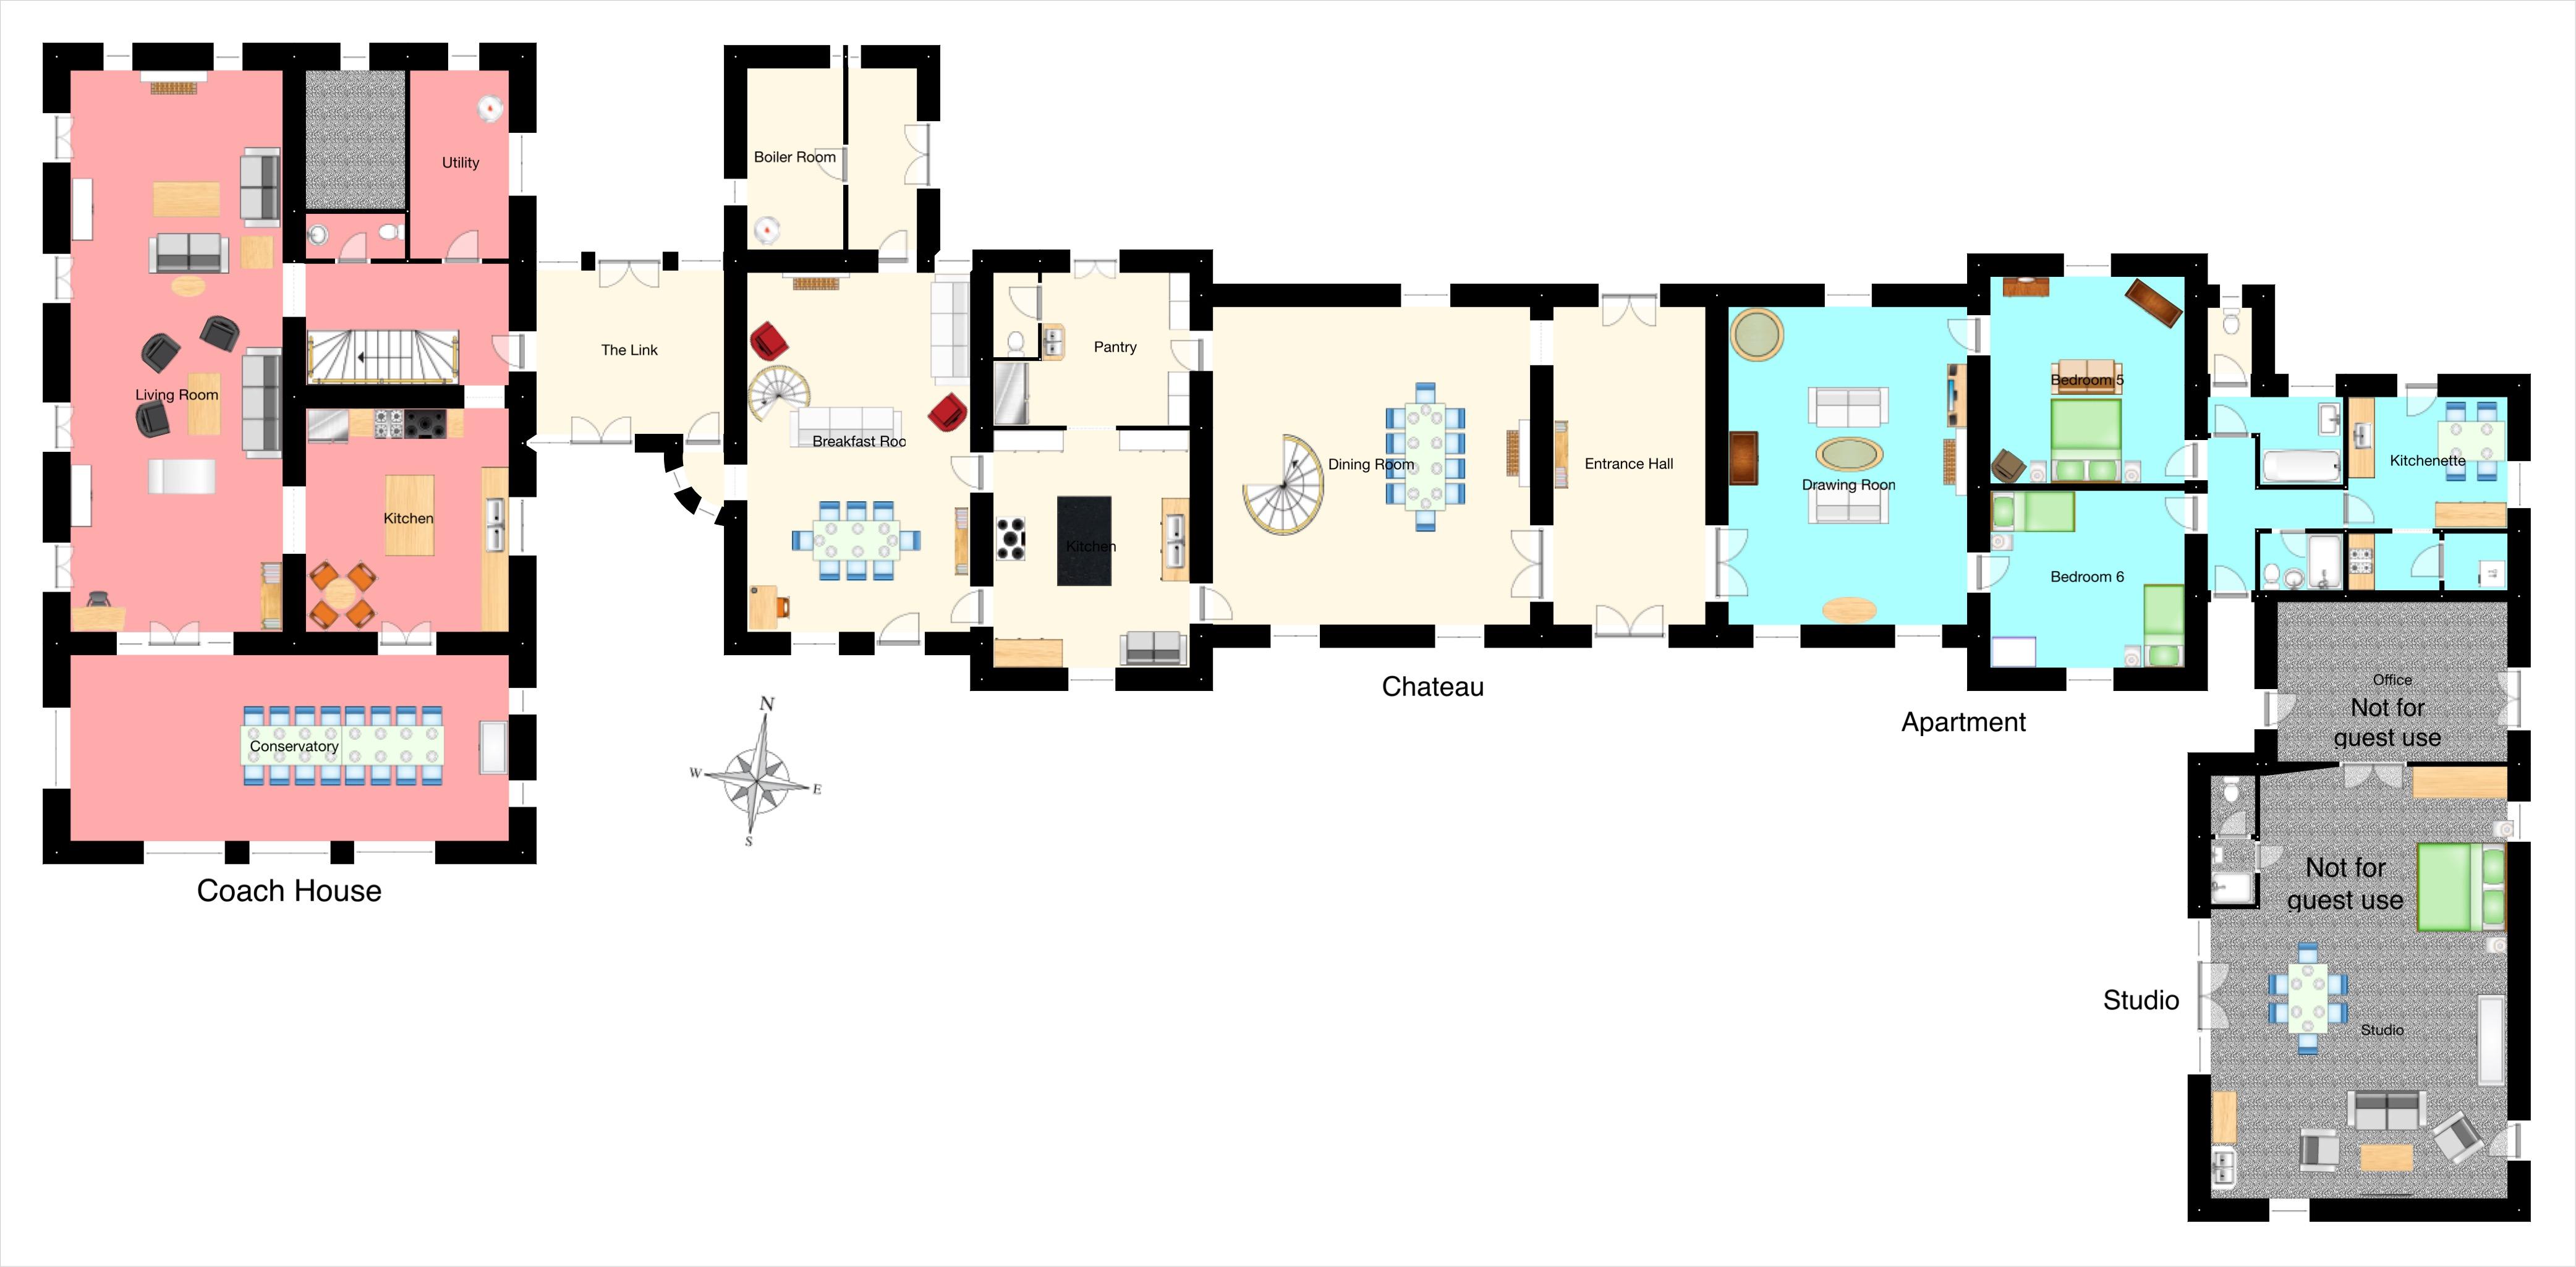 floor plan of chateau coach house apartment - Coach House Floor Plans